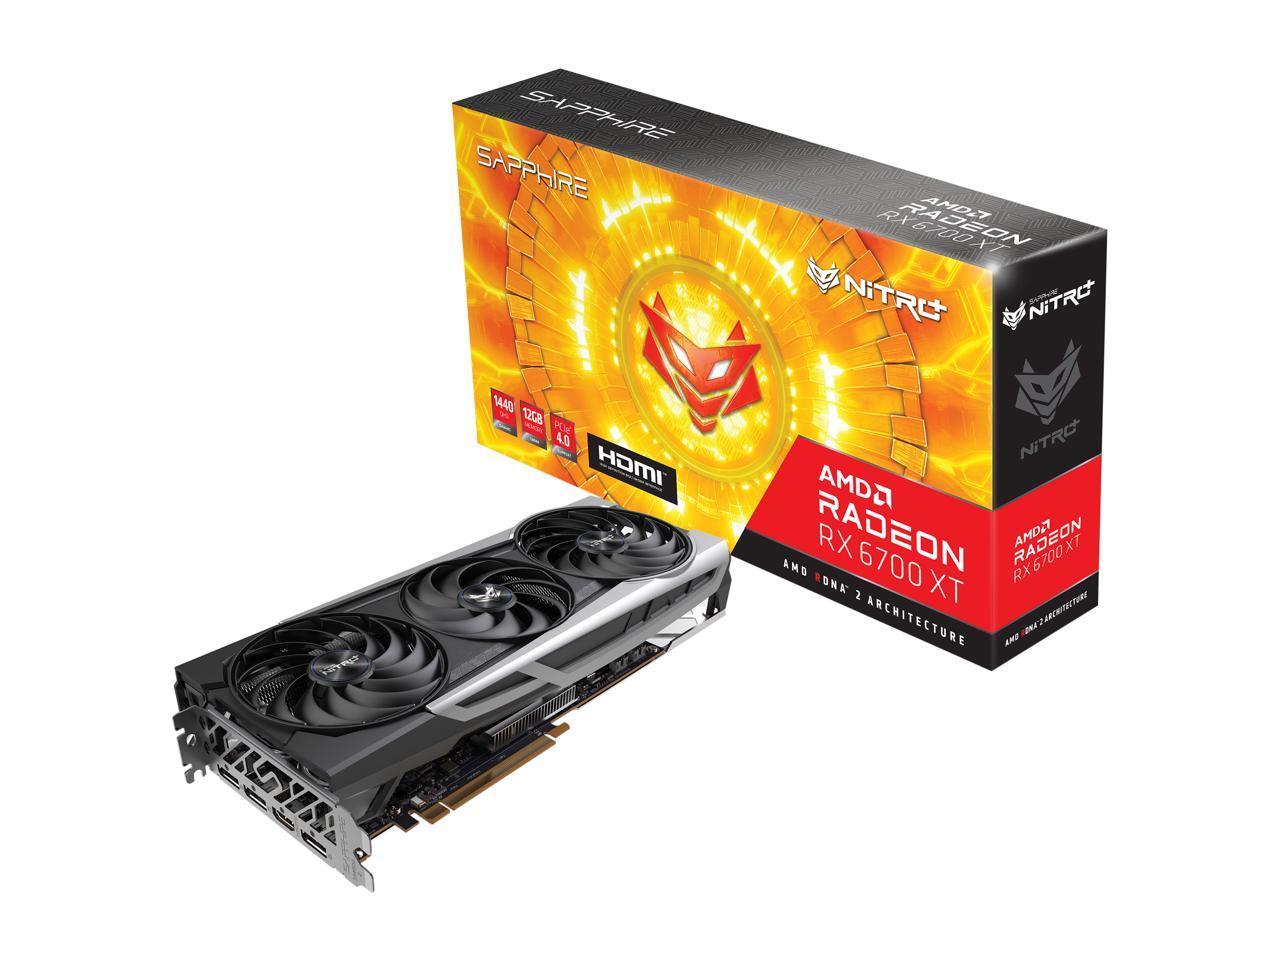 Sapphire Nitro+ AMD Radeon RX 6700 XT Gaming OC 12GB GDDR6 H